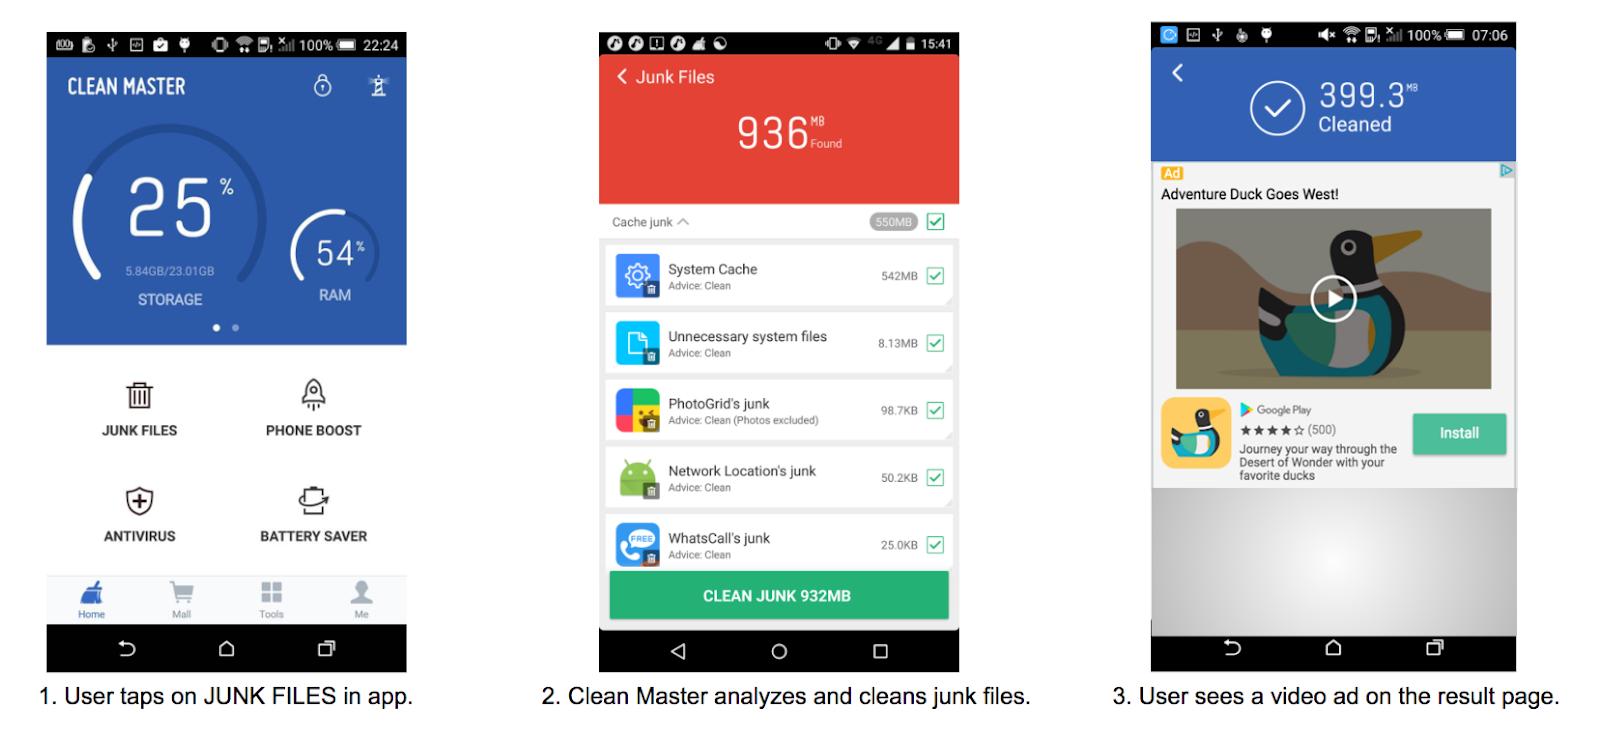 cheetah mobile improves user ad experience while increasing app performance with admob's native video ads - 4nvD9bpB3SVMXUTVtlxHWDGq98YnstISb3i3PnEgrVosqqUb8DZXqLCtlumB22rcbIuo9i71Bewv1xZm2mha7xWDt6S5AzXXLY1st6SuOFPD27NFImnLNUAnUS724kswzNVlZahR - Cheetah Mobile Improves User Ad Experience While Increasing App Performance with AdMob's Native Video Ads